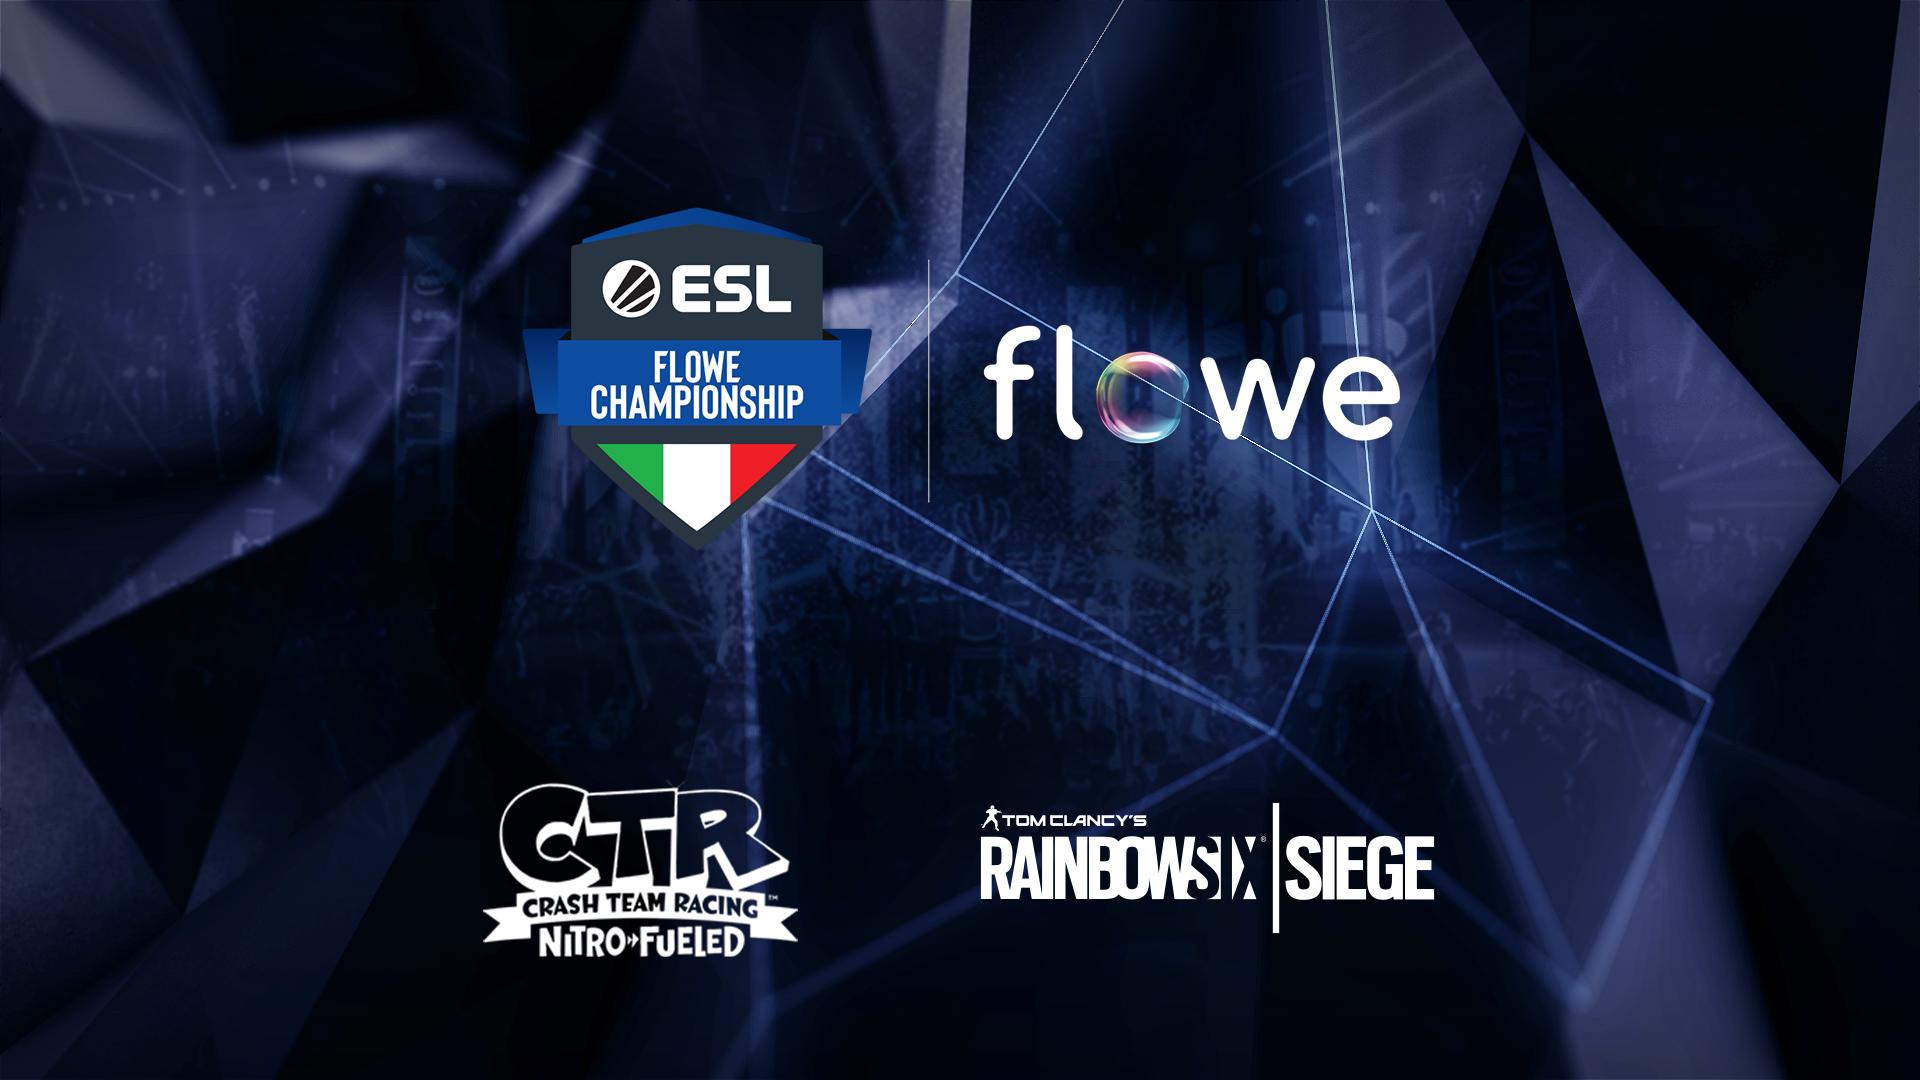 Nasce l'ESL Flowe Championship - Esport e PS4